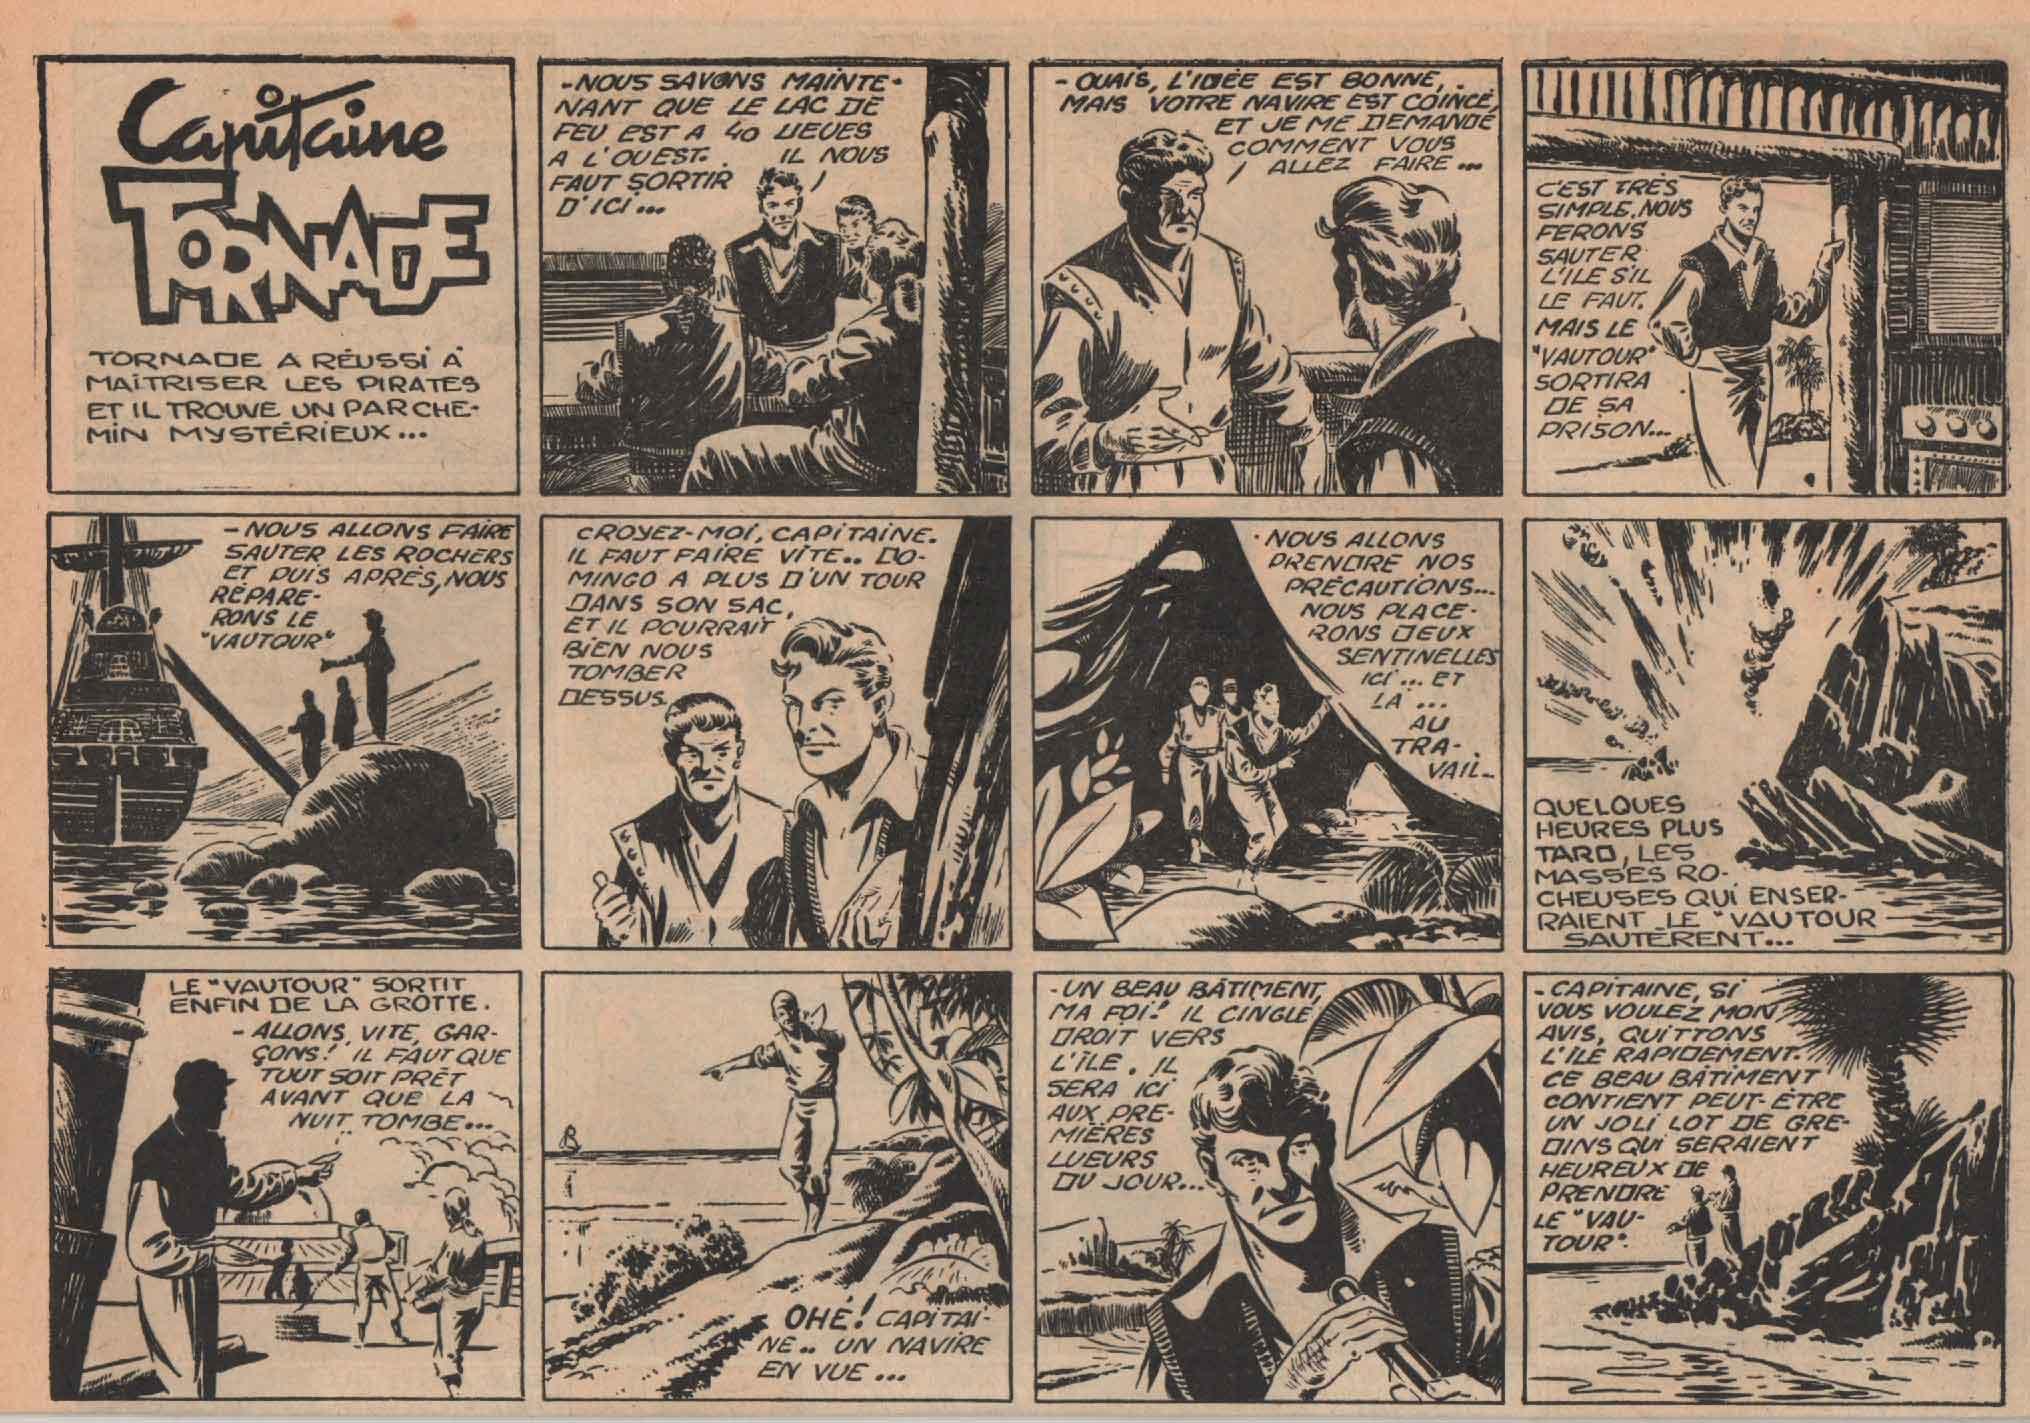 « Capitaine Tornade » Zig Zag/Zorro n° 6 (décembre 1952).